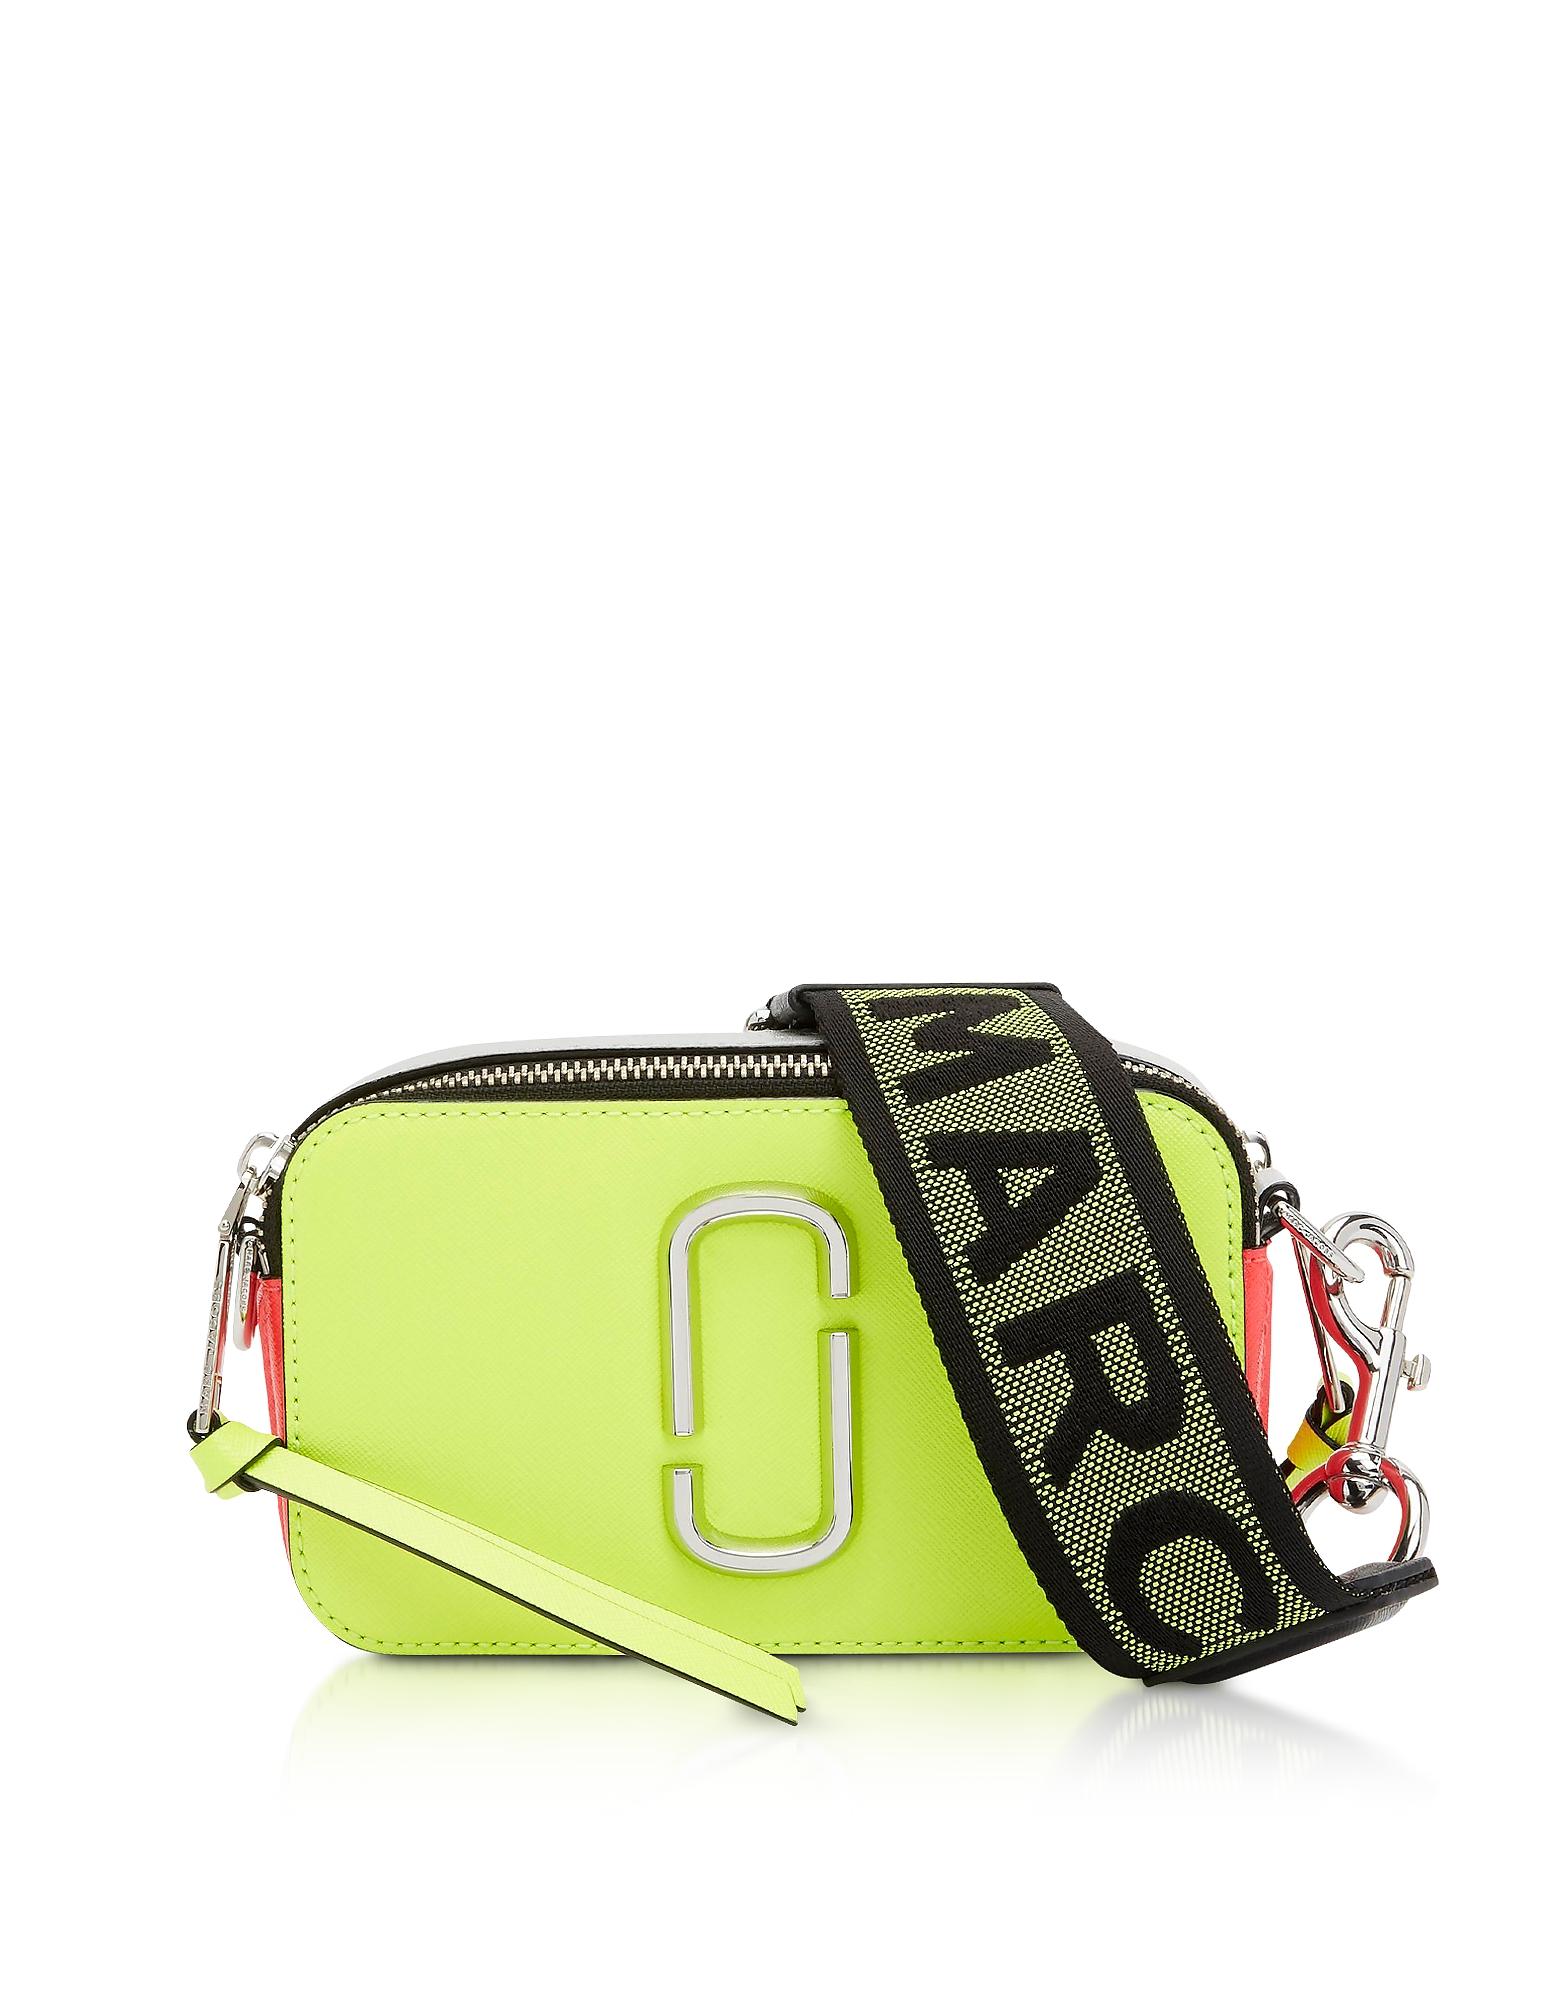 Marc Jacobs Handbags, Snapshot Fluorescent Small Camera Bag